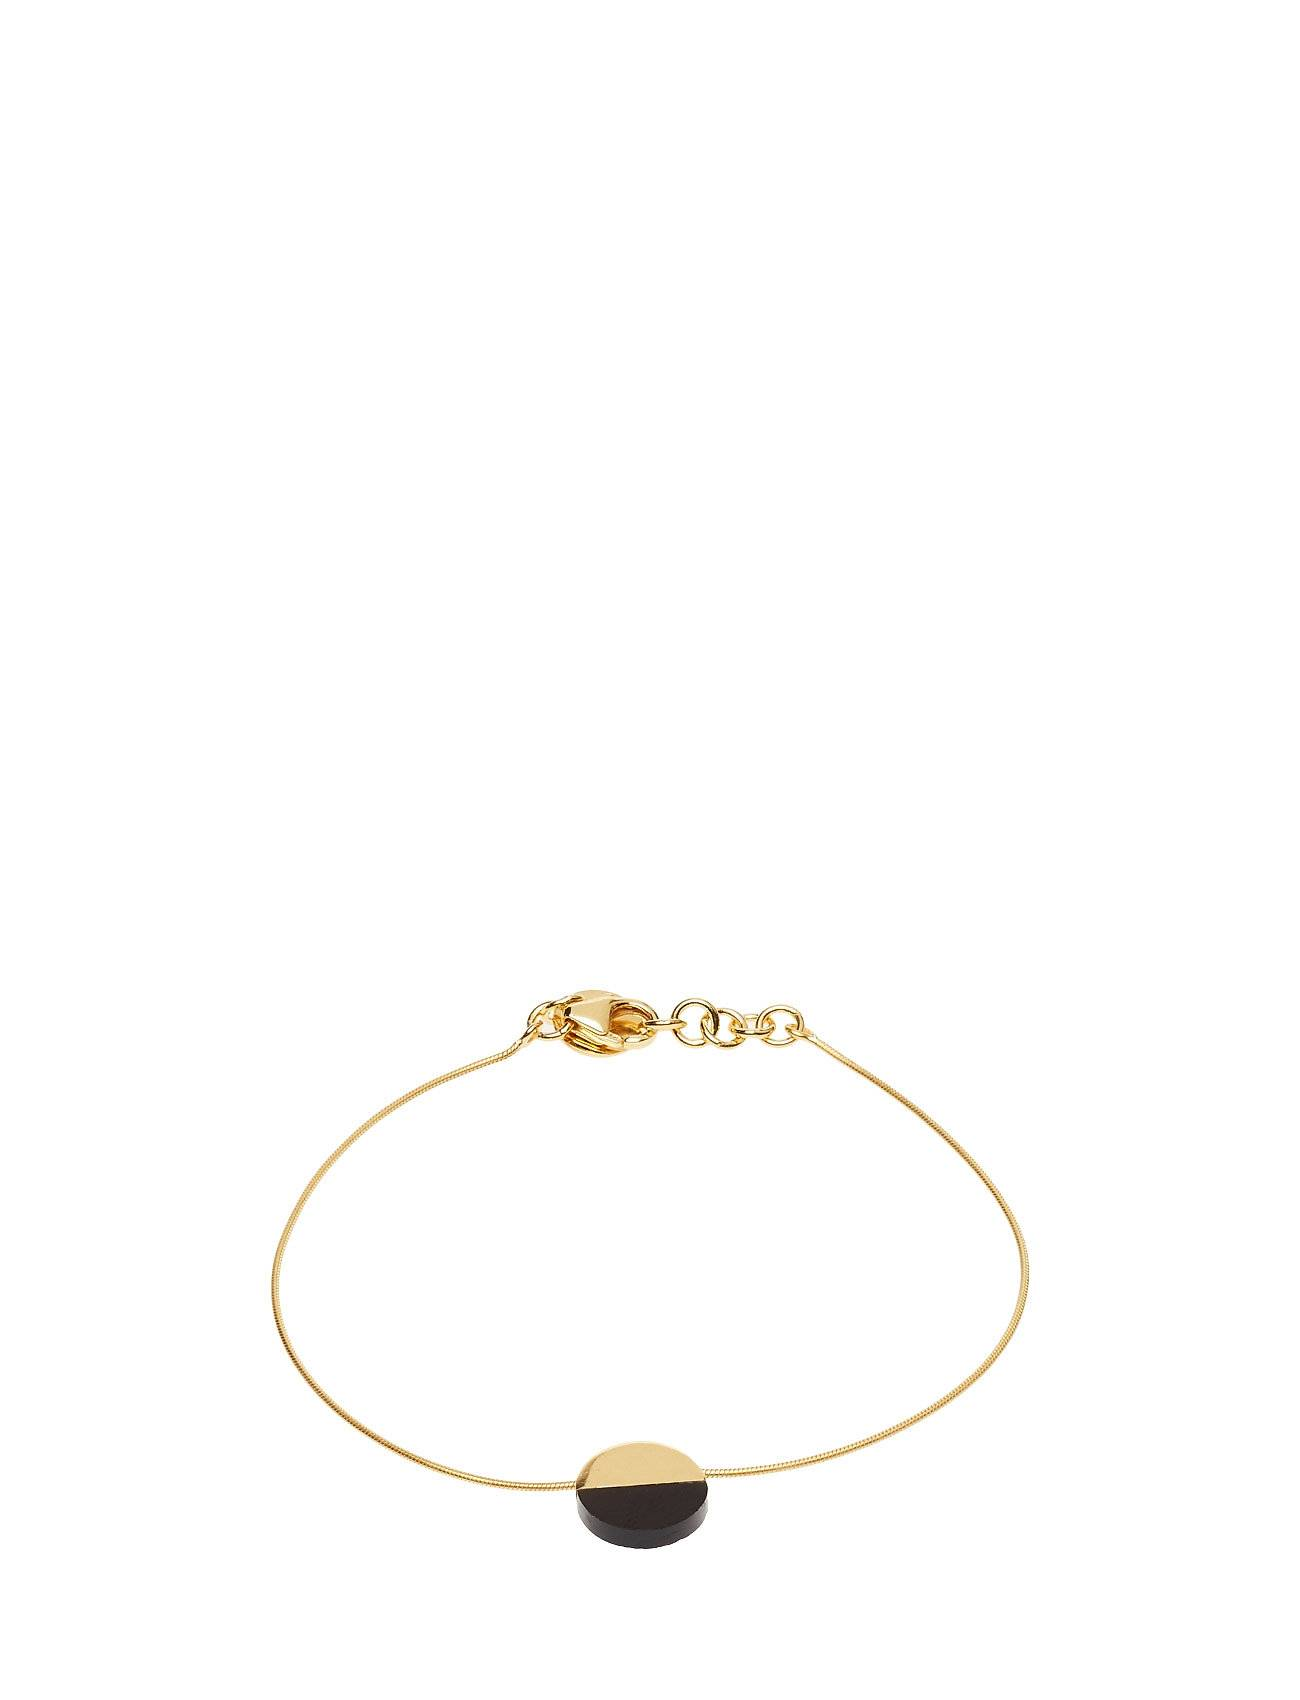 Syster P New Dixxi Bracelet Black Onyx